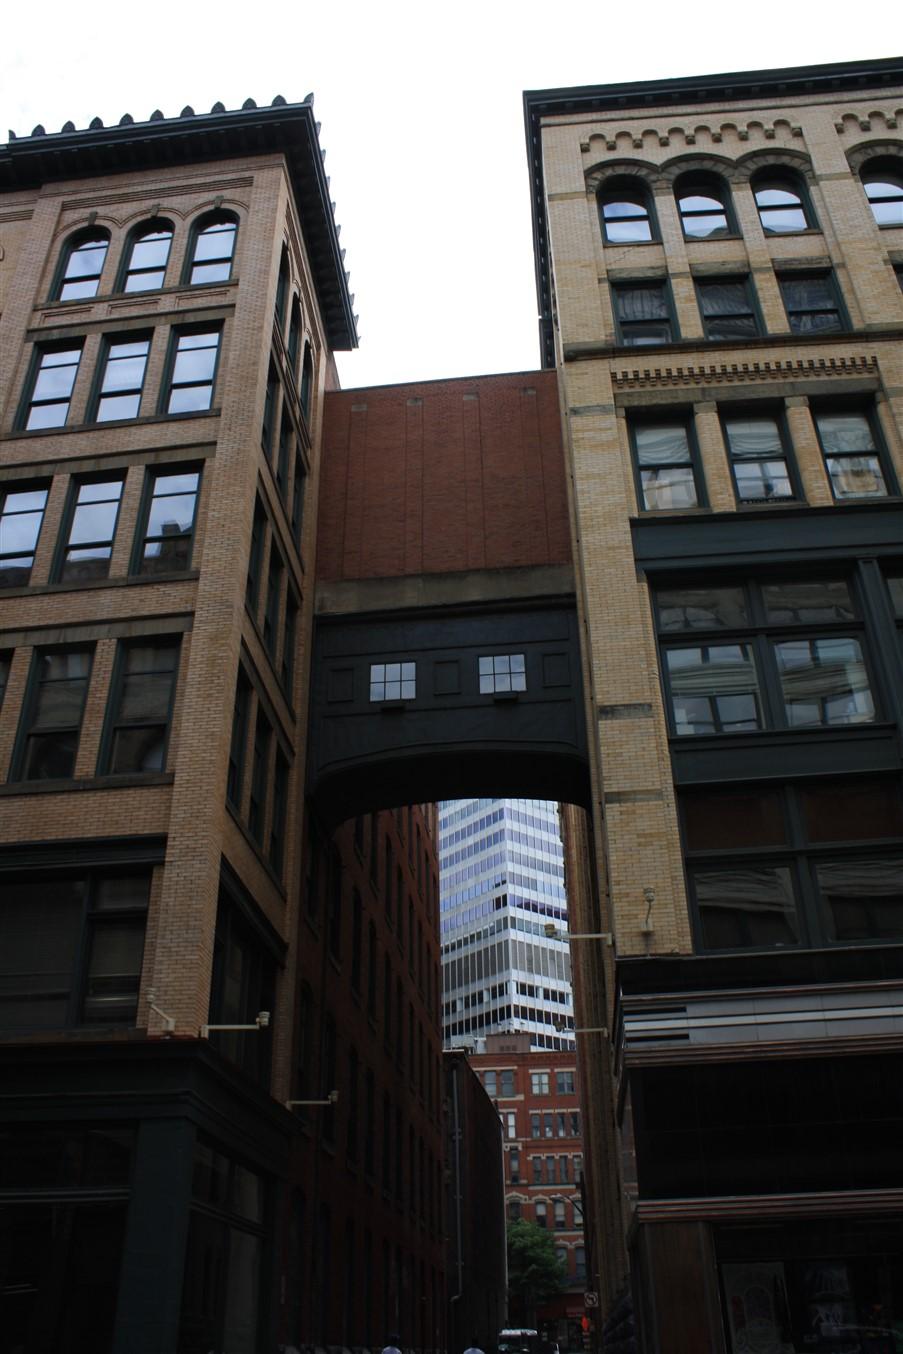 2009 06 13 Pittsburgh 28.jpg